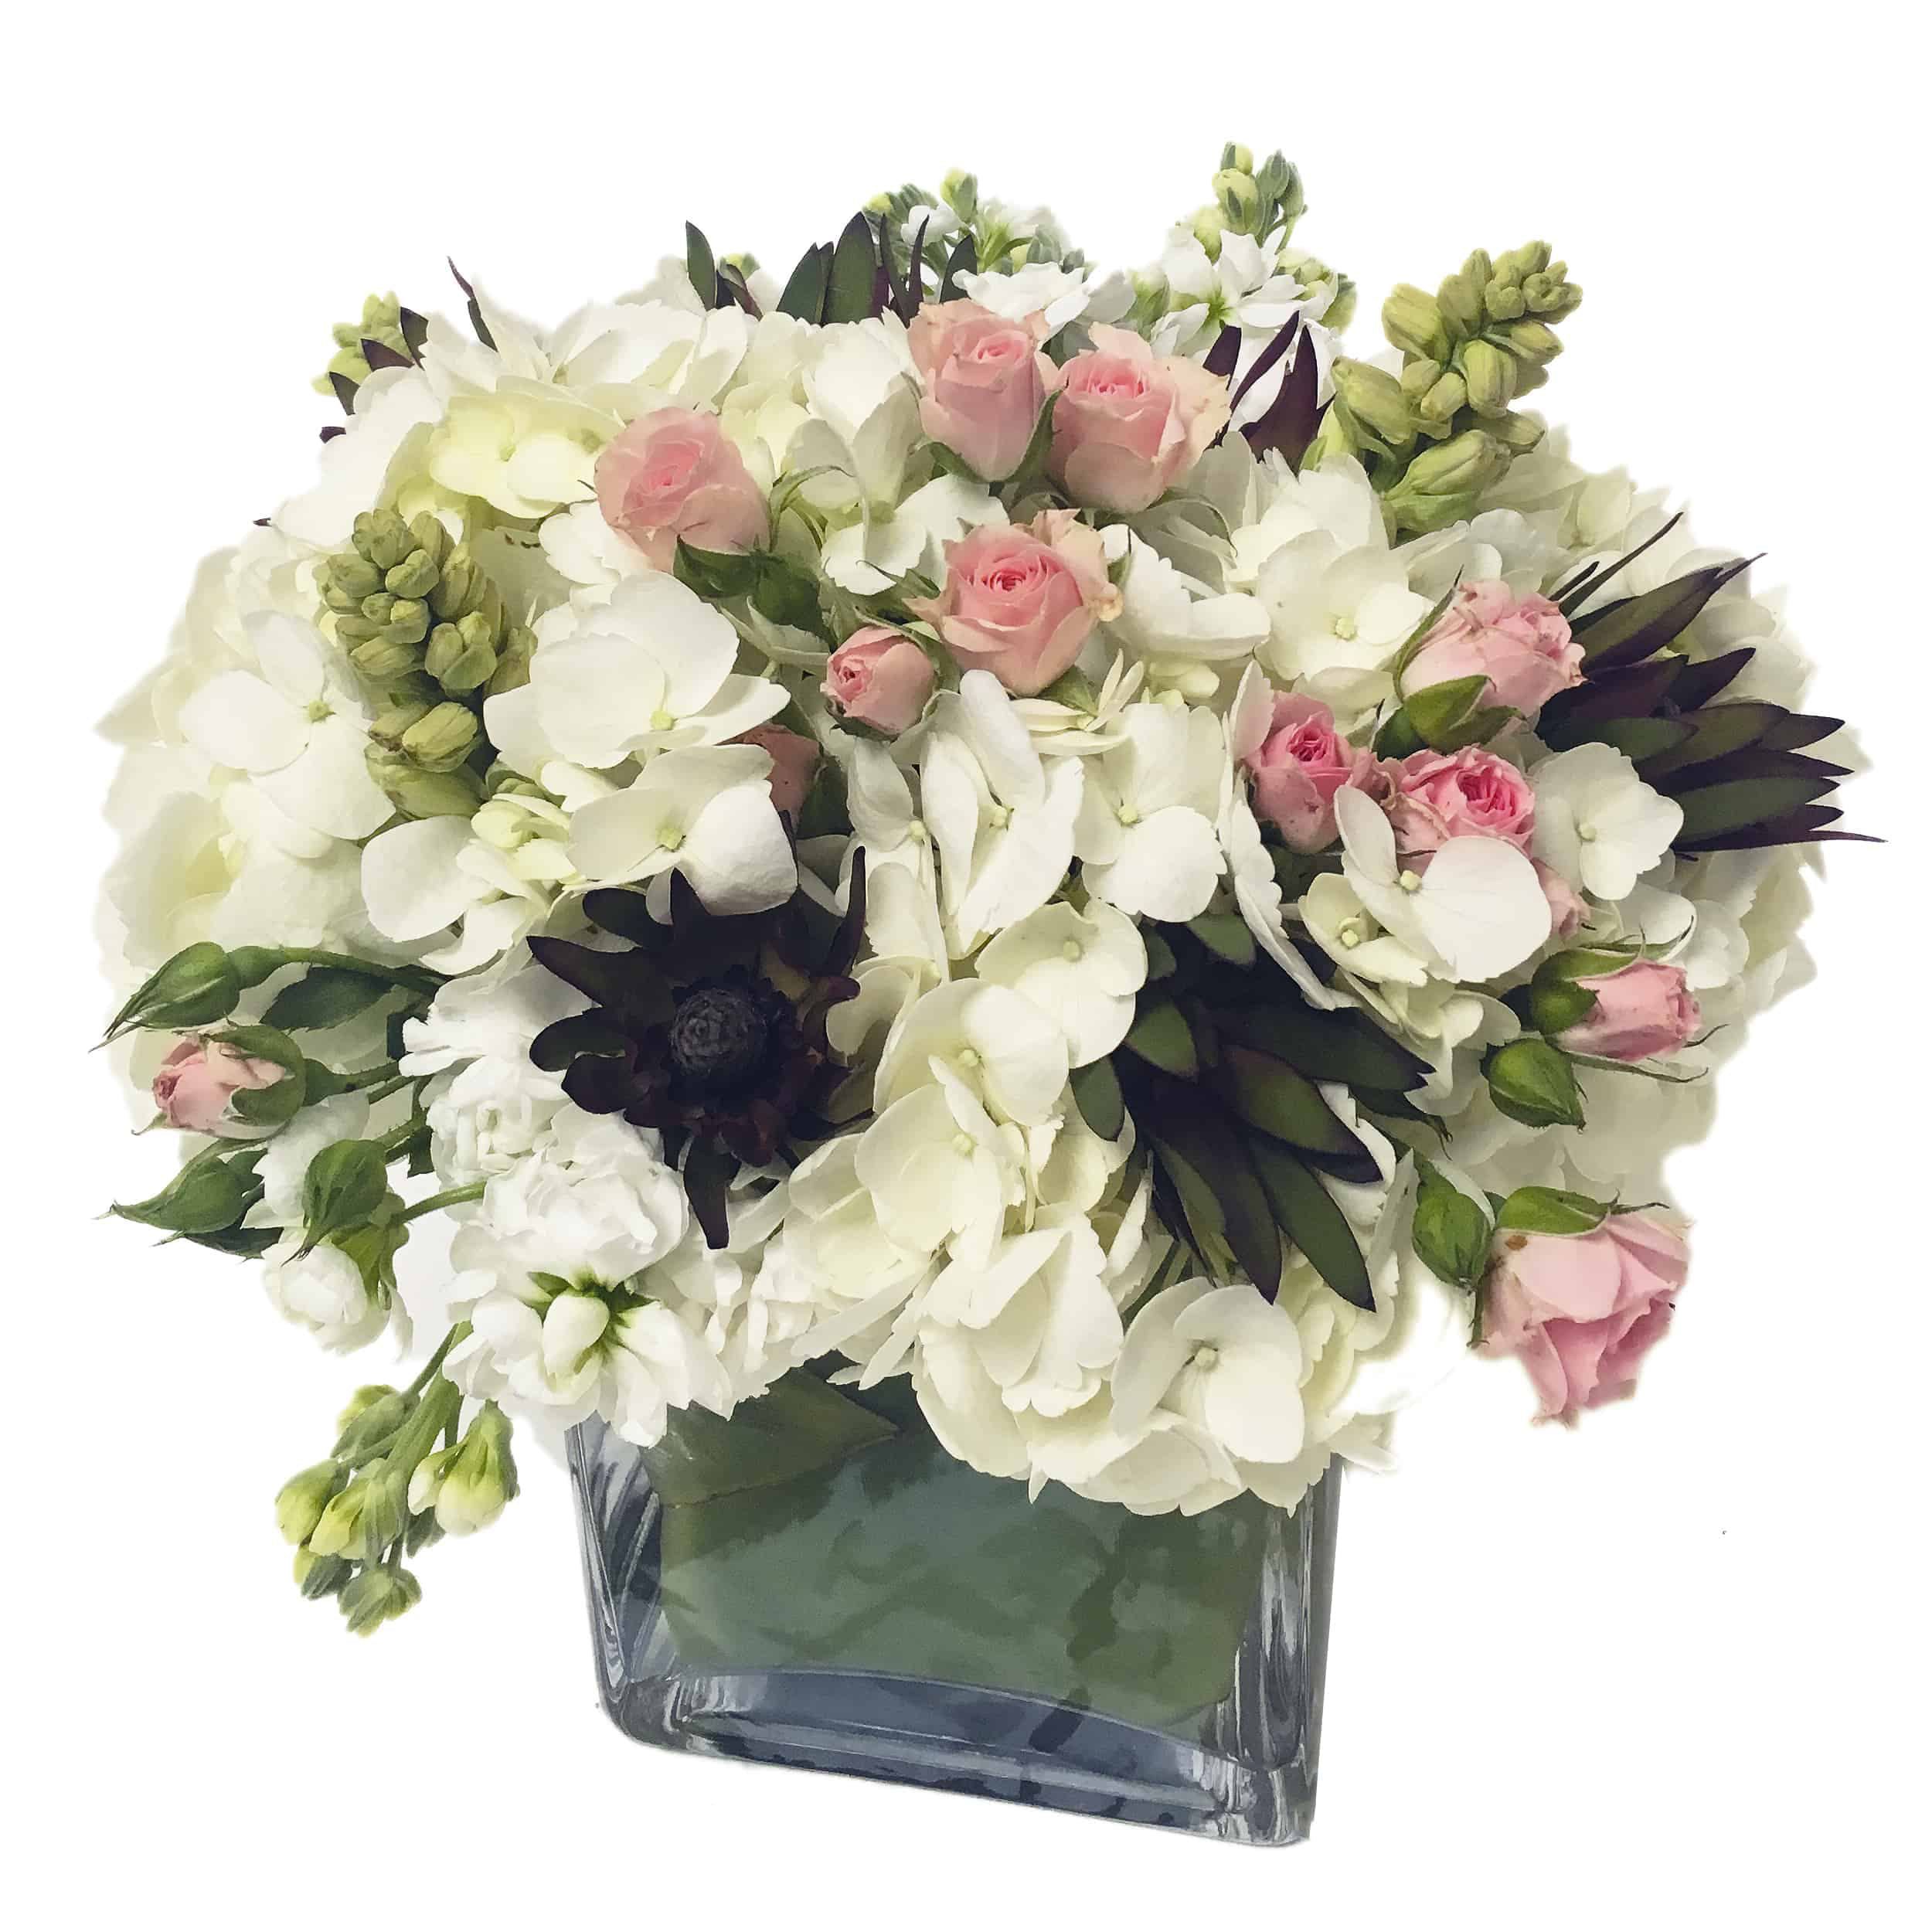 Celadon and Salmon Flower Arrangement | San Francisco Florist Since 1871 Free Bay Area and San Francisco Flower Delivery